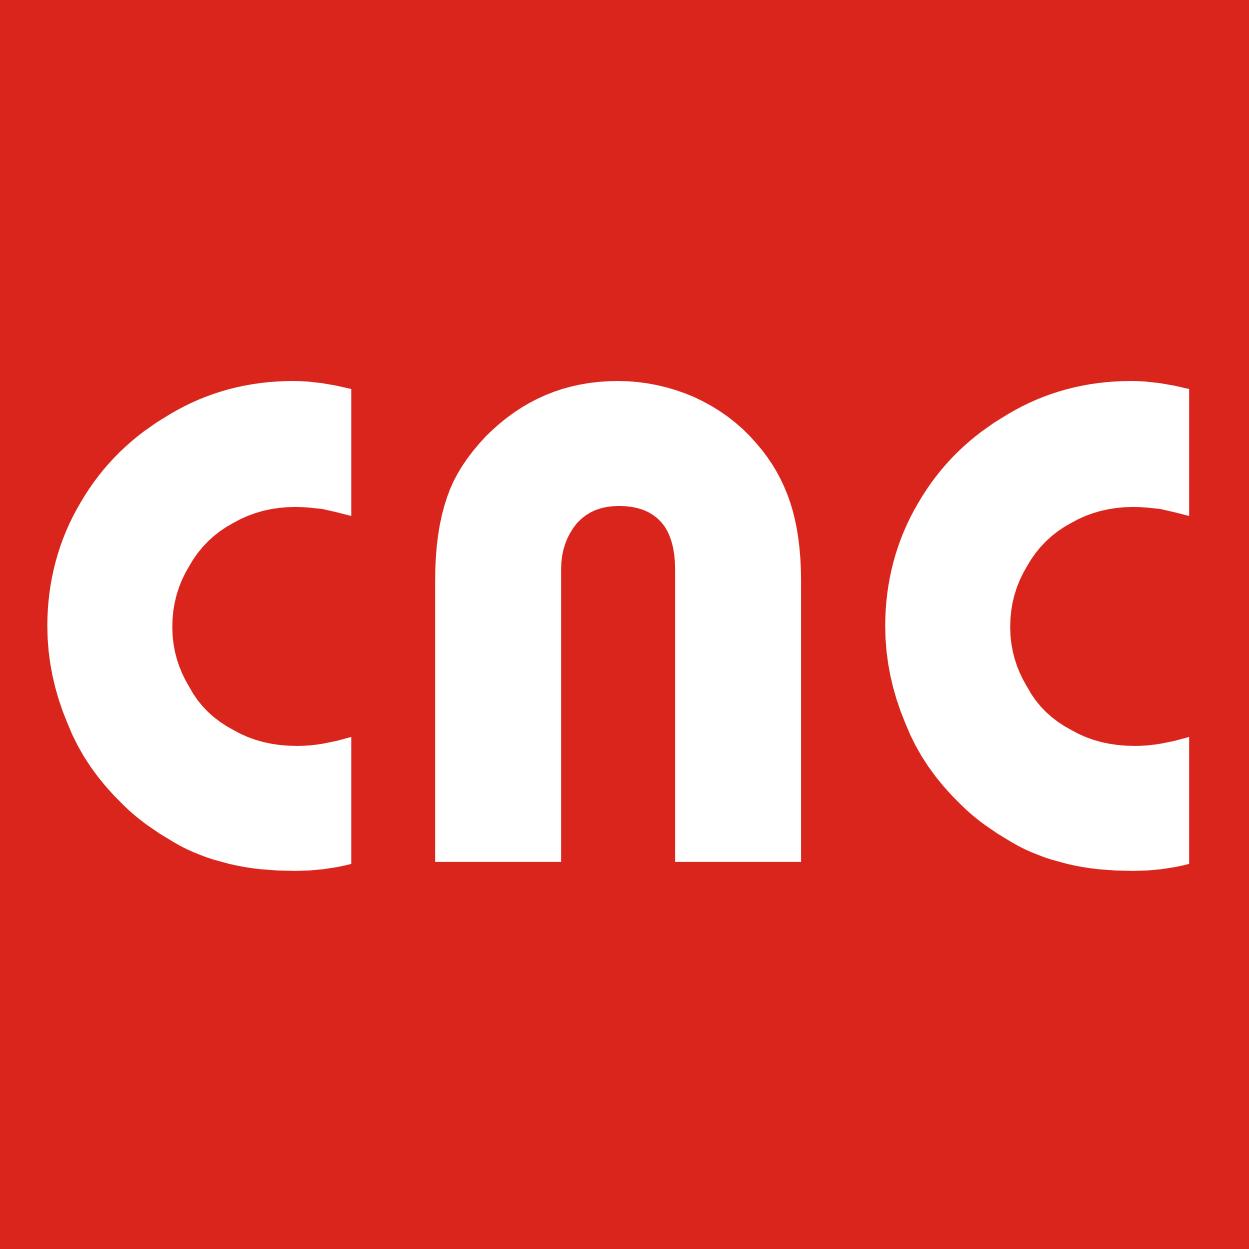 CNC GLASS INTERLAYER often